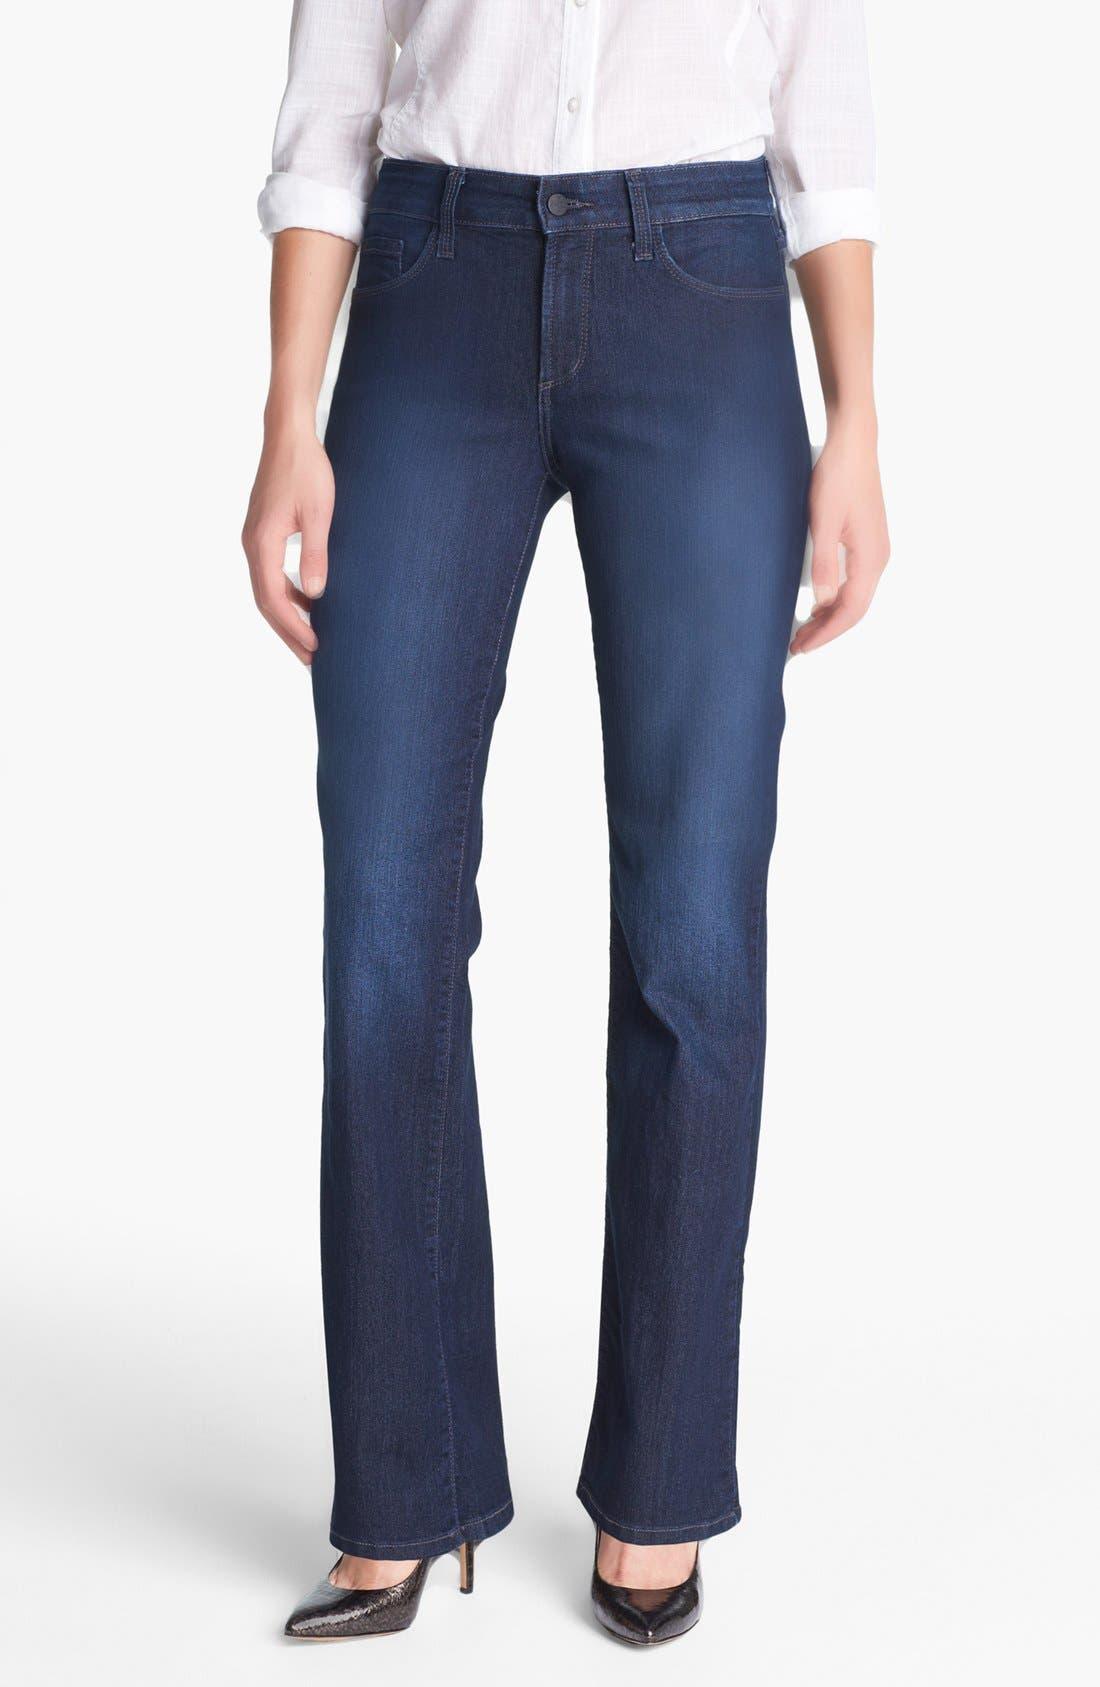 Main Image - NYDJ 'Barbara' Embellished Stretch Bootcut Jeans (Burbank)